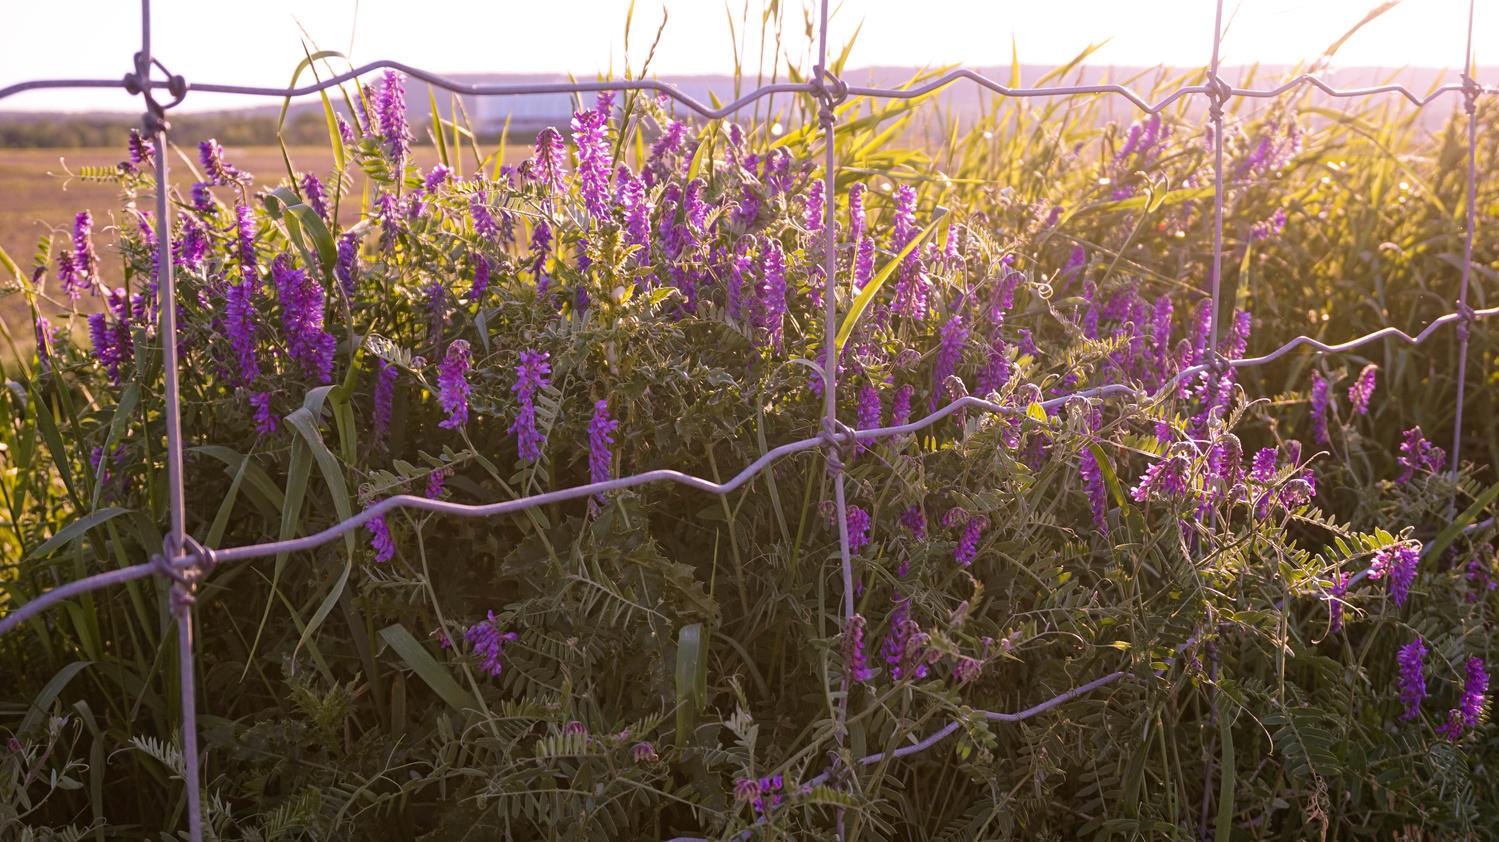 Lilac in the Sun by Natalia Sadowski